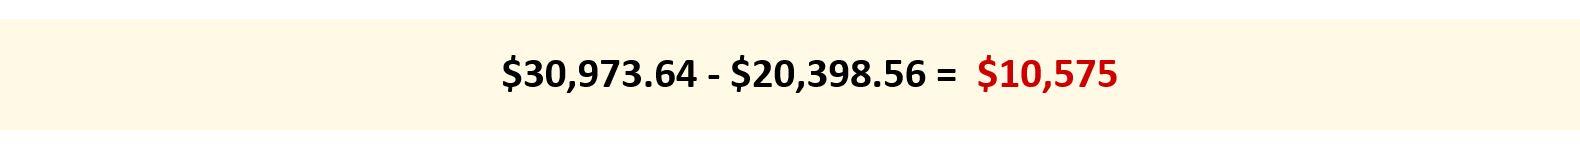 $30,973.64 - $20,398.56 = $10,575